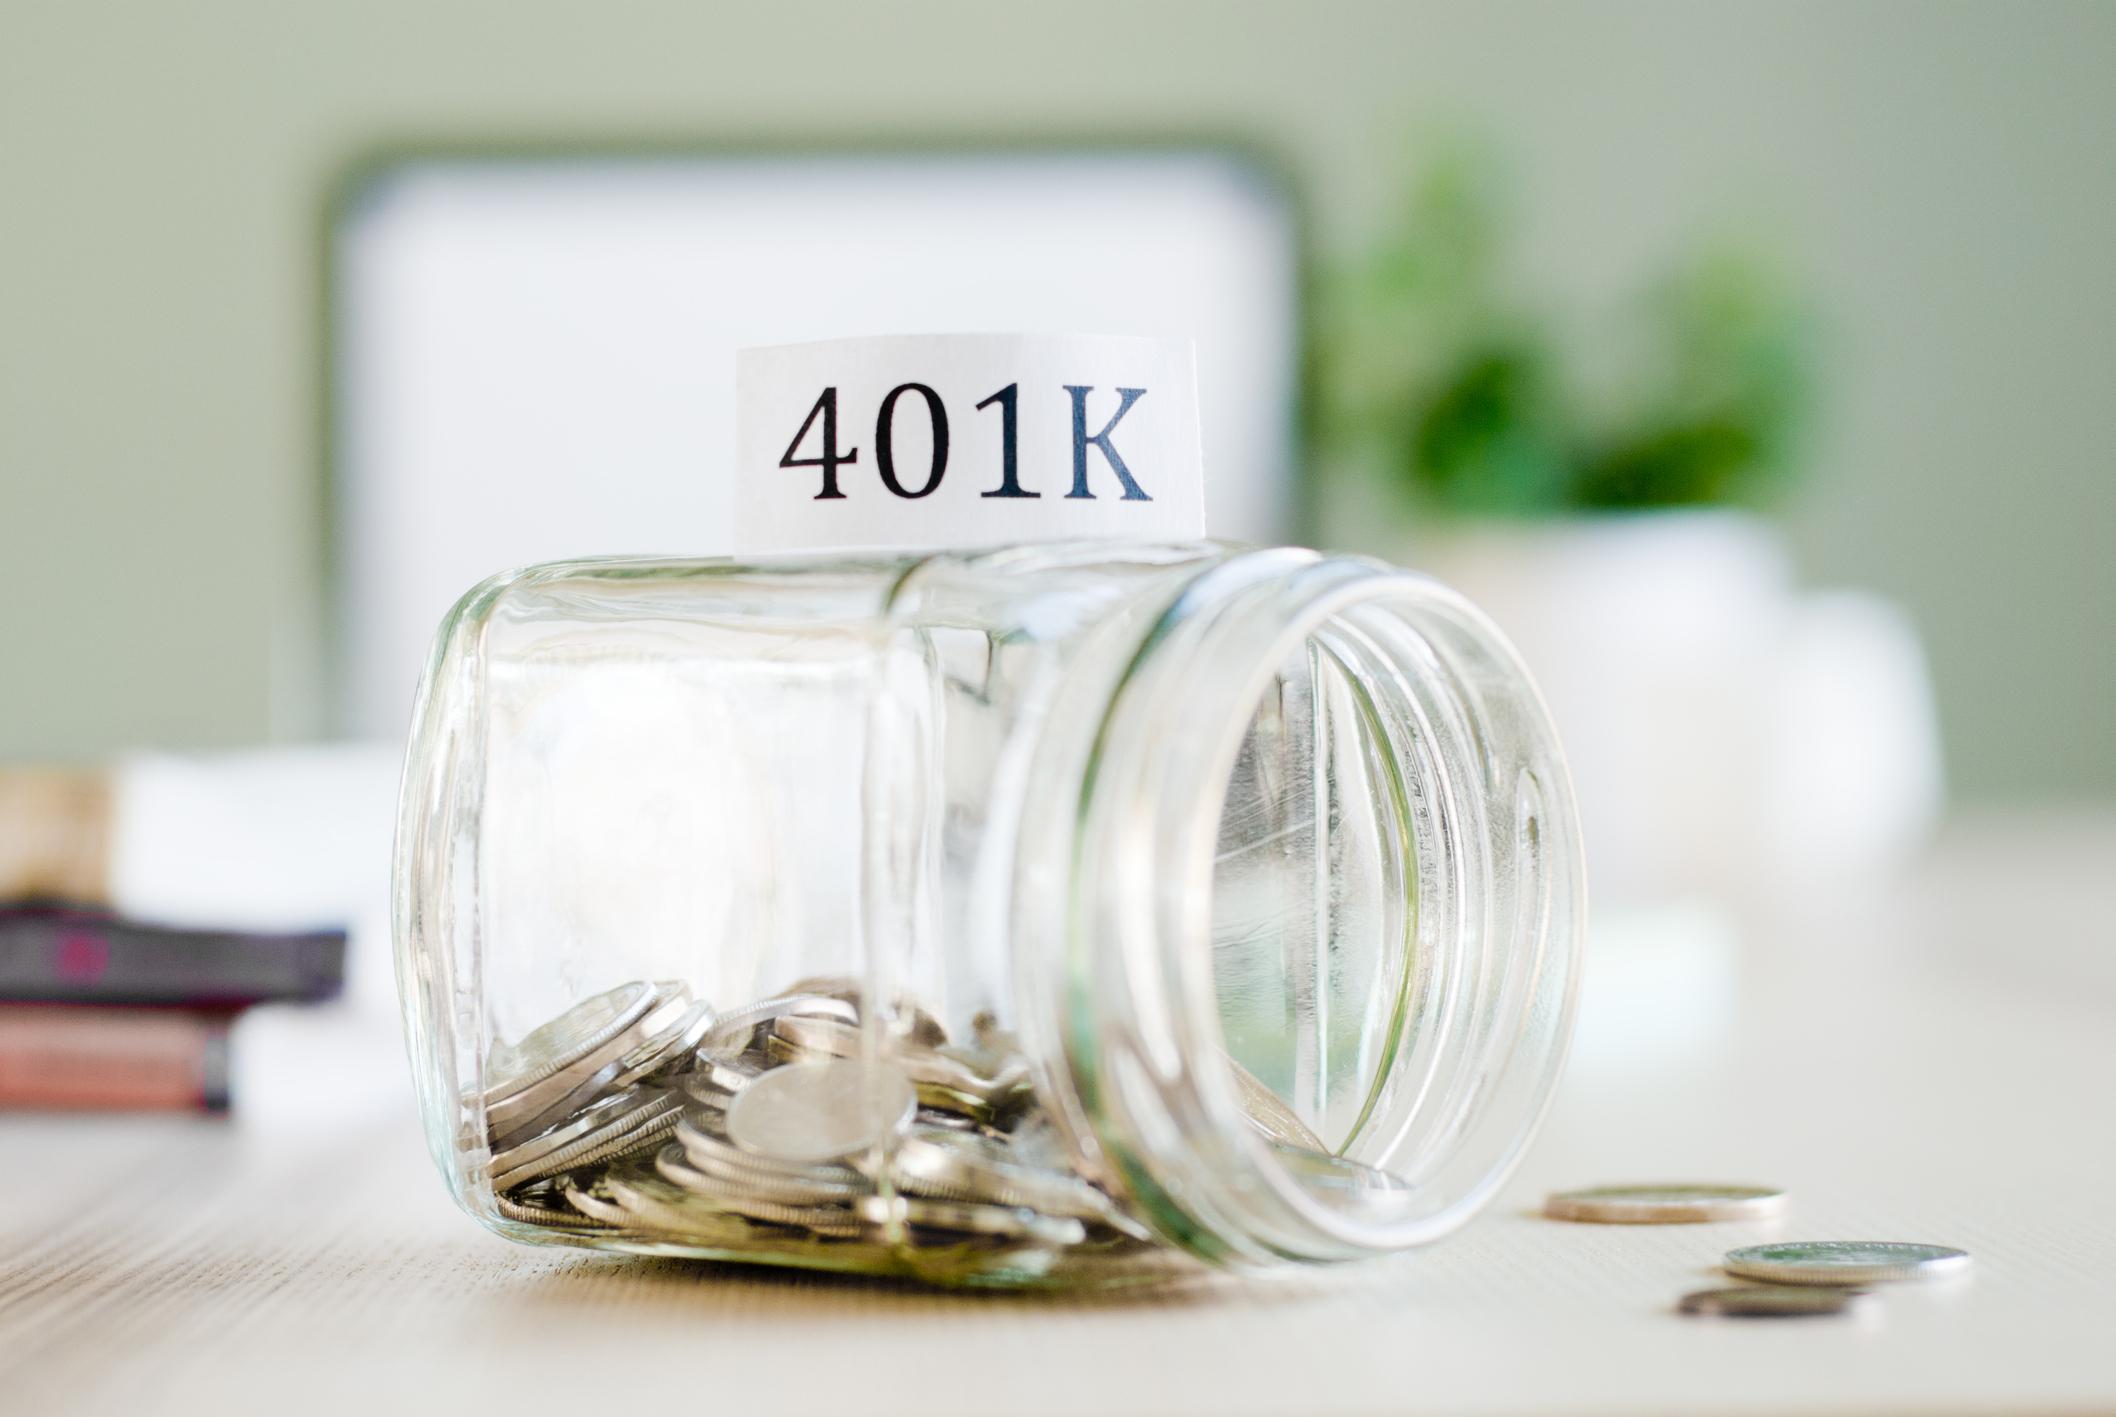 401k savings jar